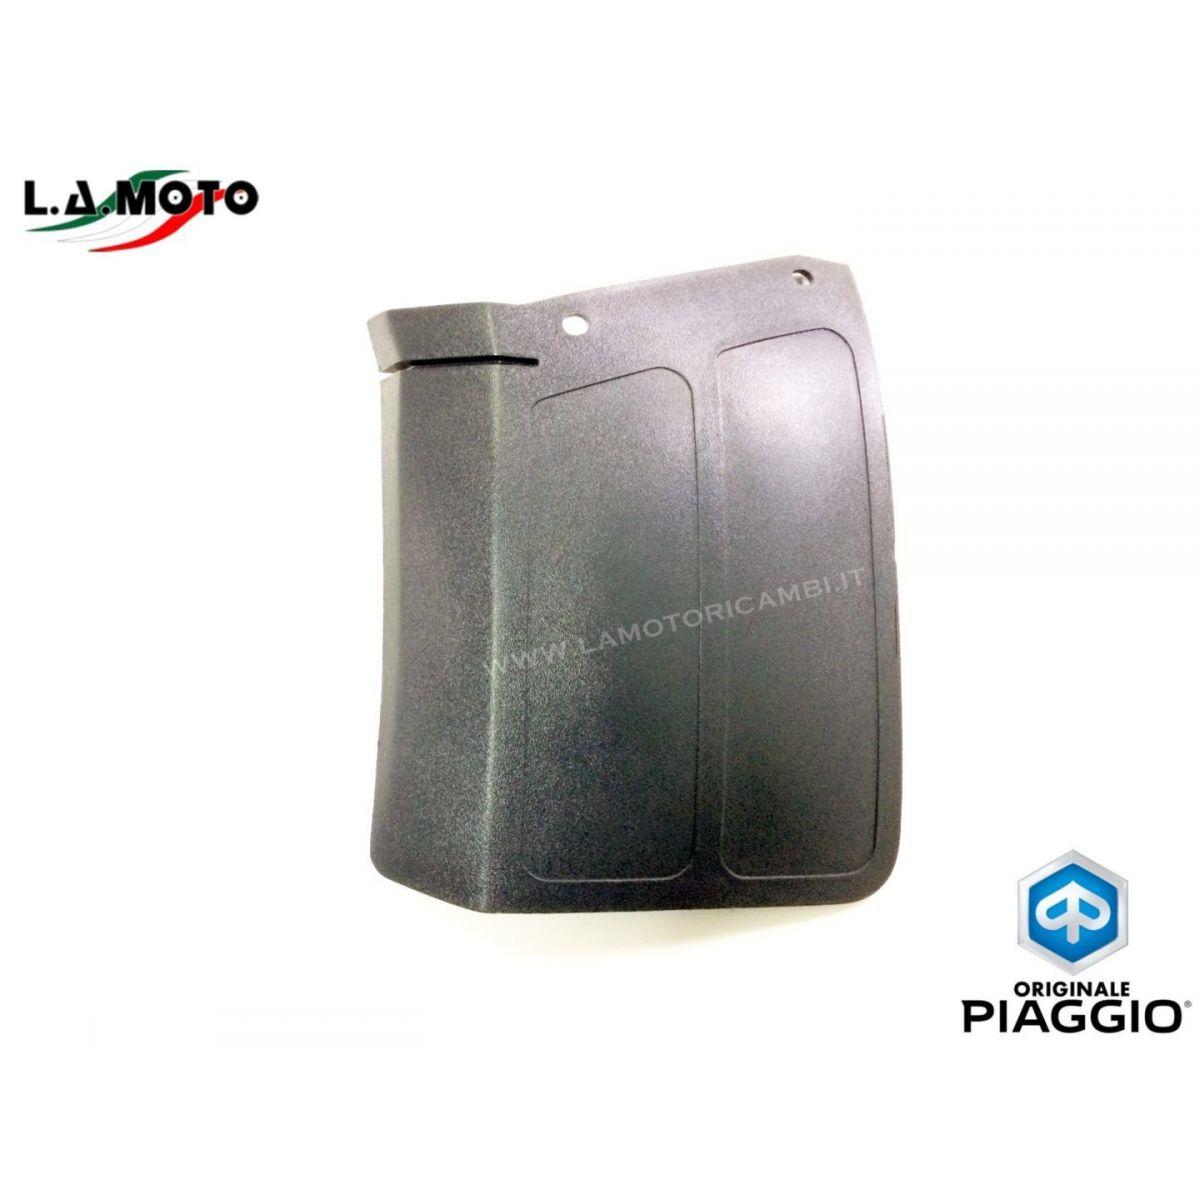 PARASPRUZZI SINISTRO PER APE CAR P2-P3 ORIGINALE PIAGGIO